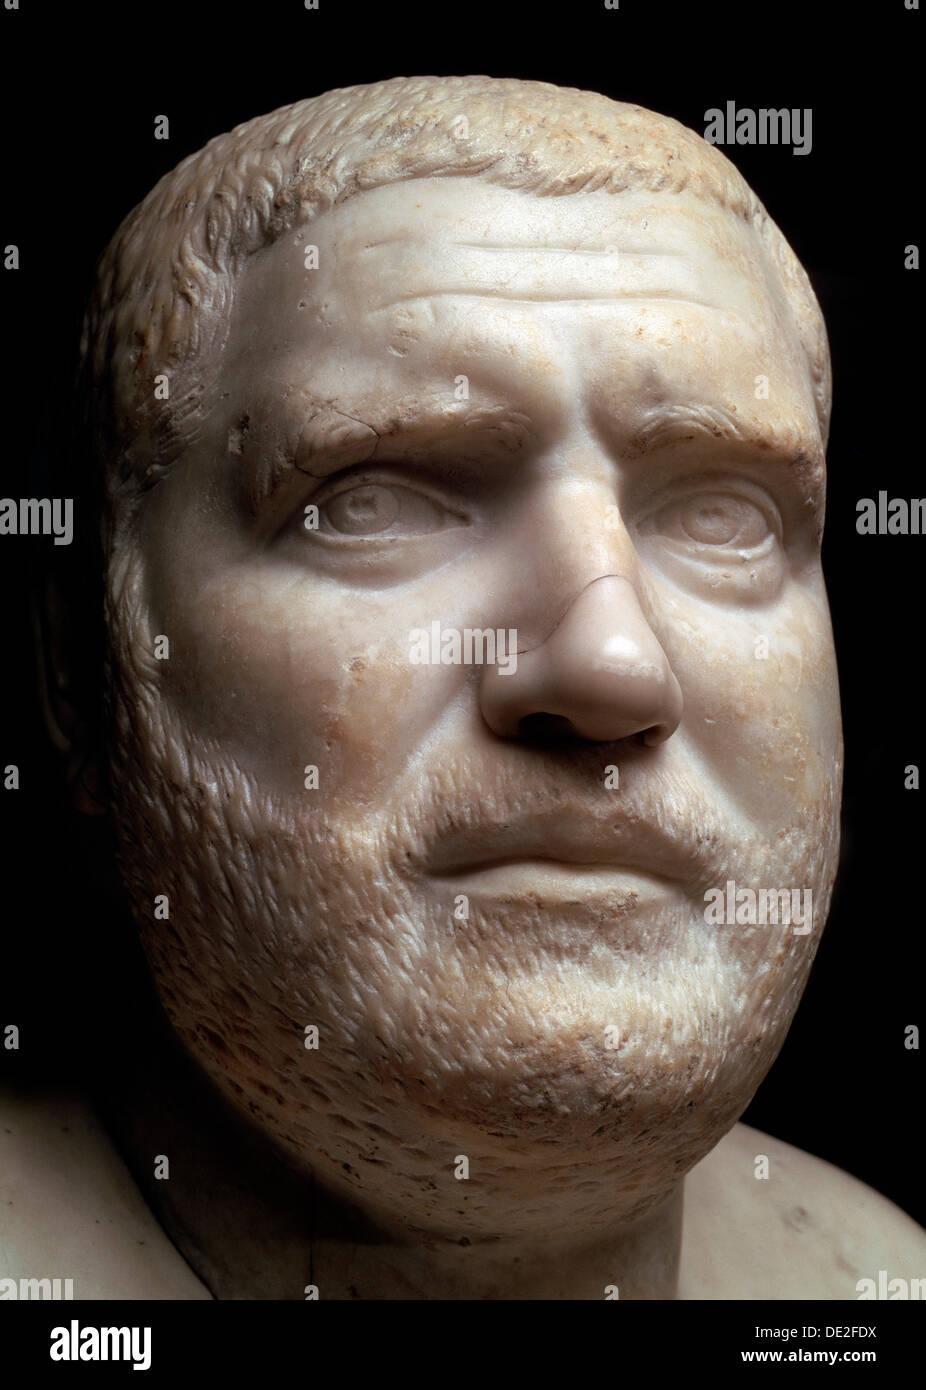 Marble portrait bust of the Roman Emperor Balbinus, 3rd century. - Stock Image